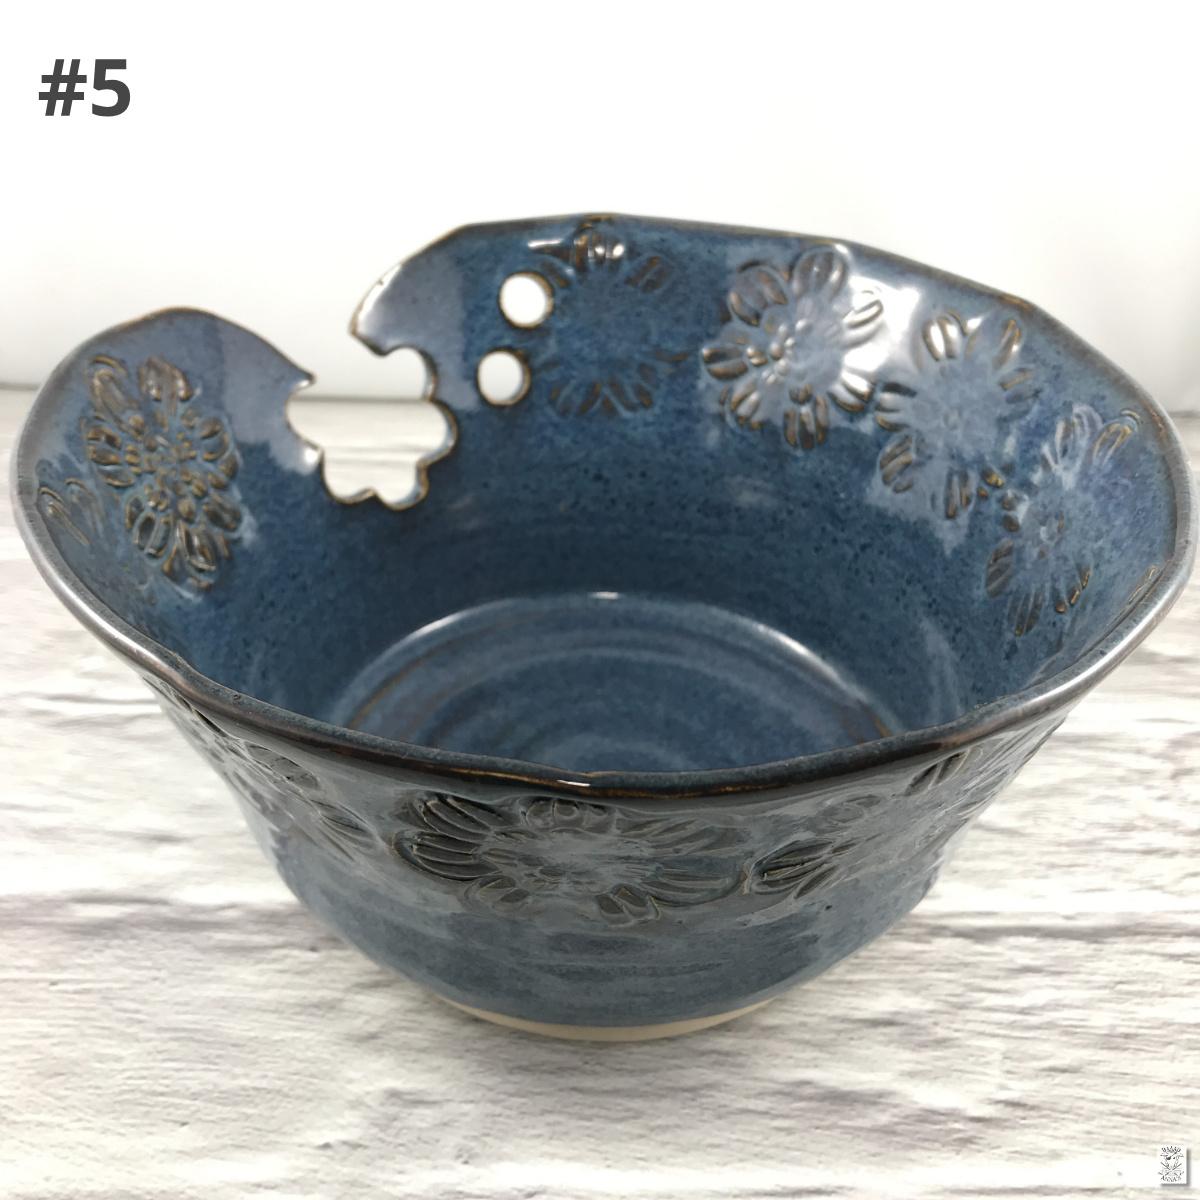 Lavender Lampworks Yarn Bowl